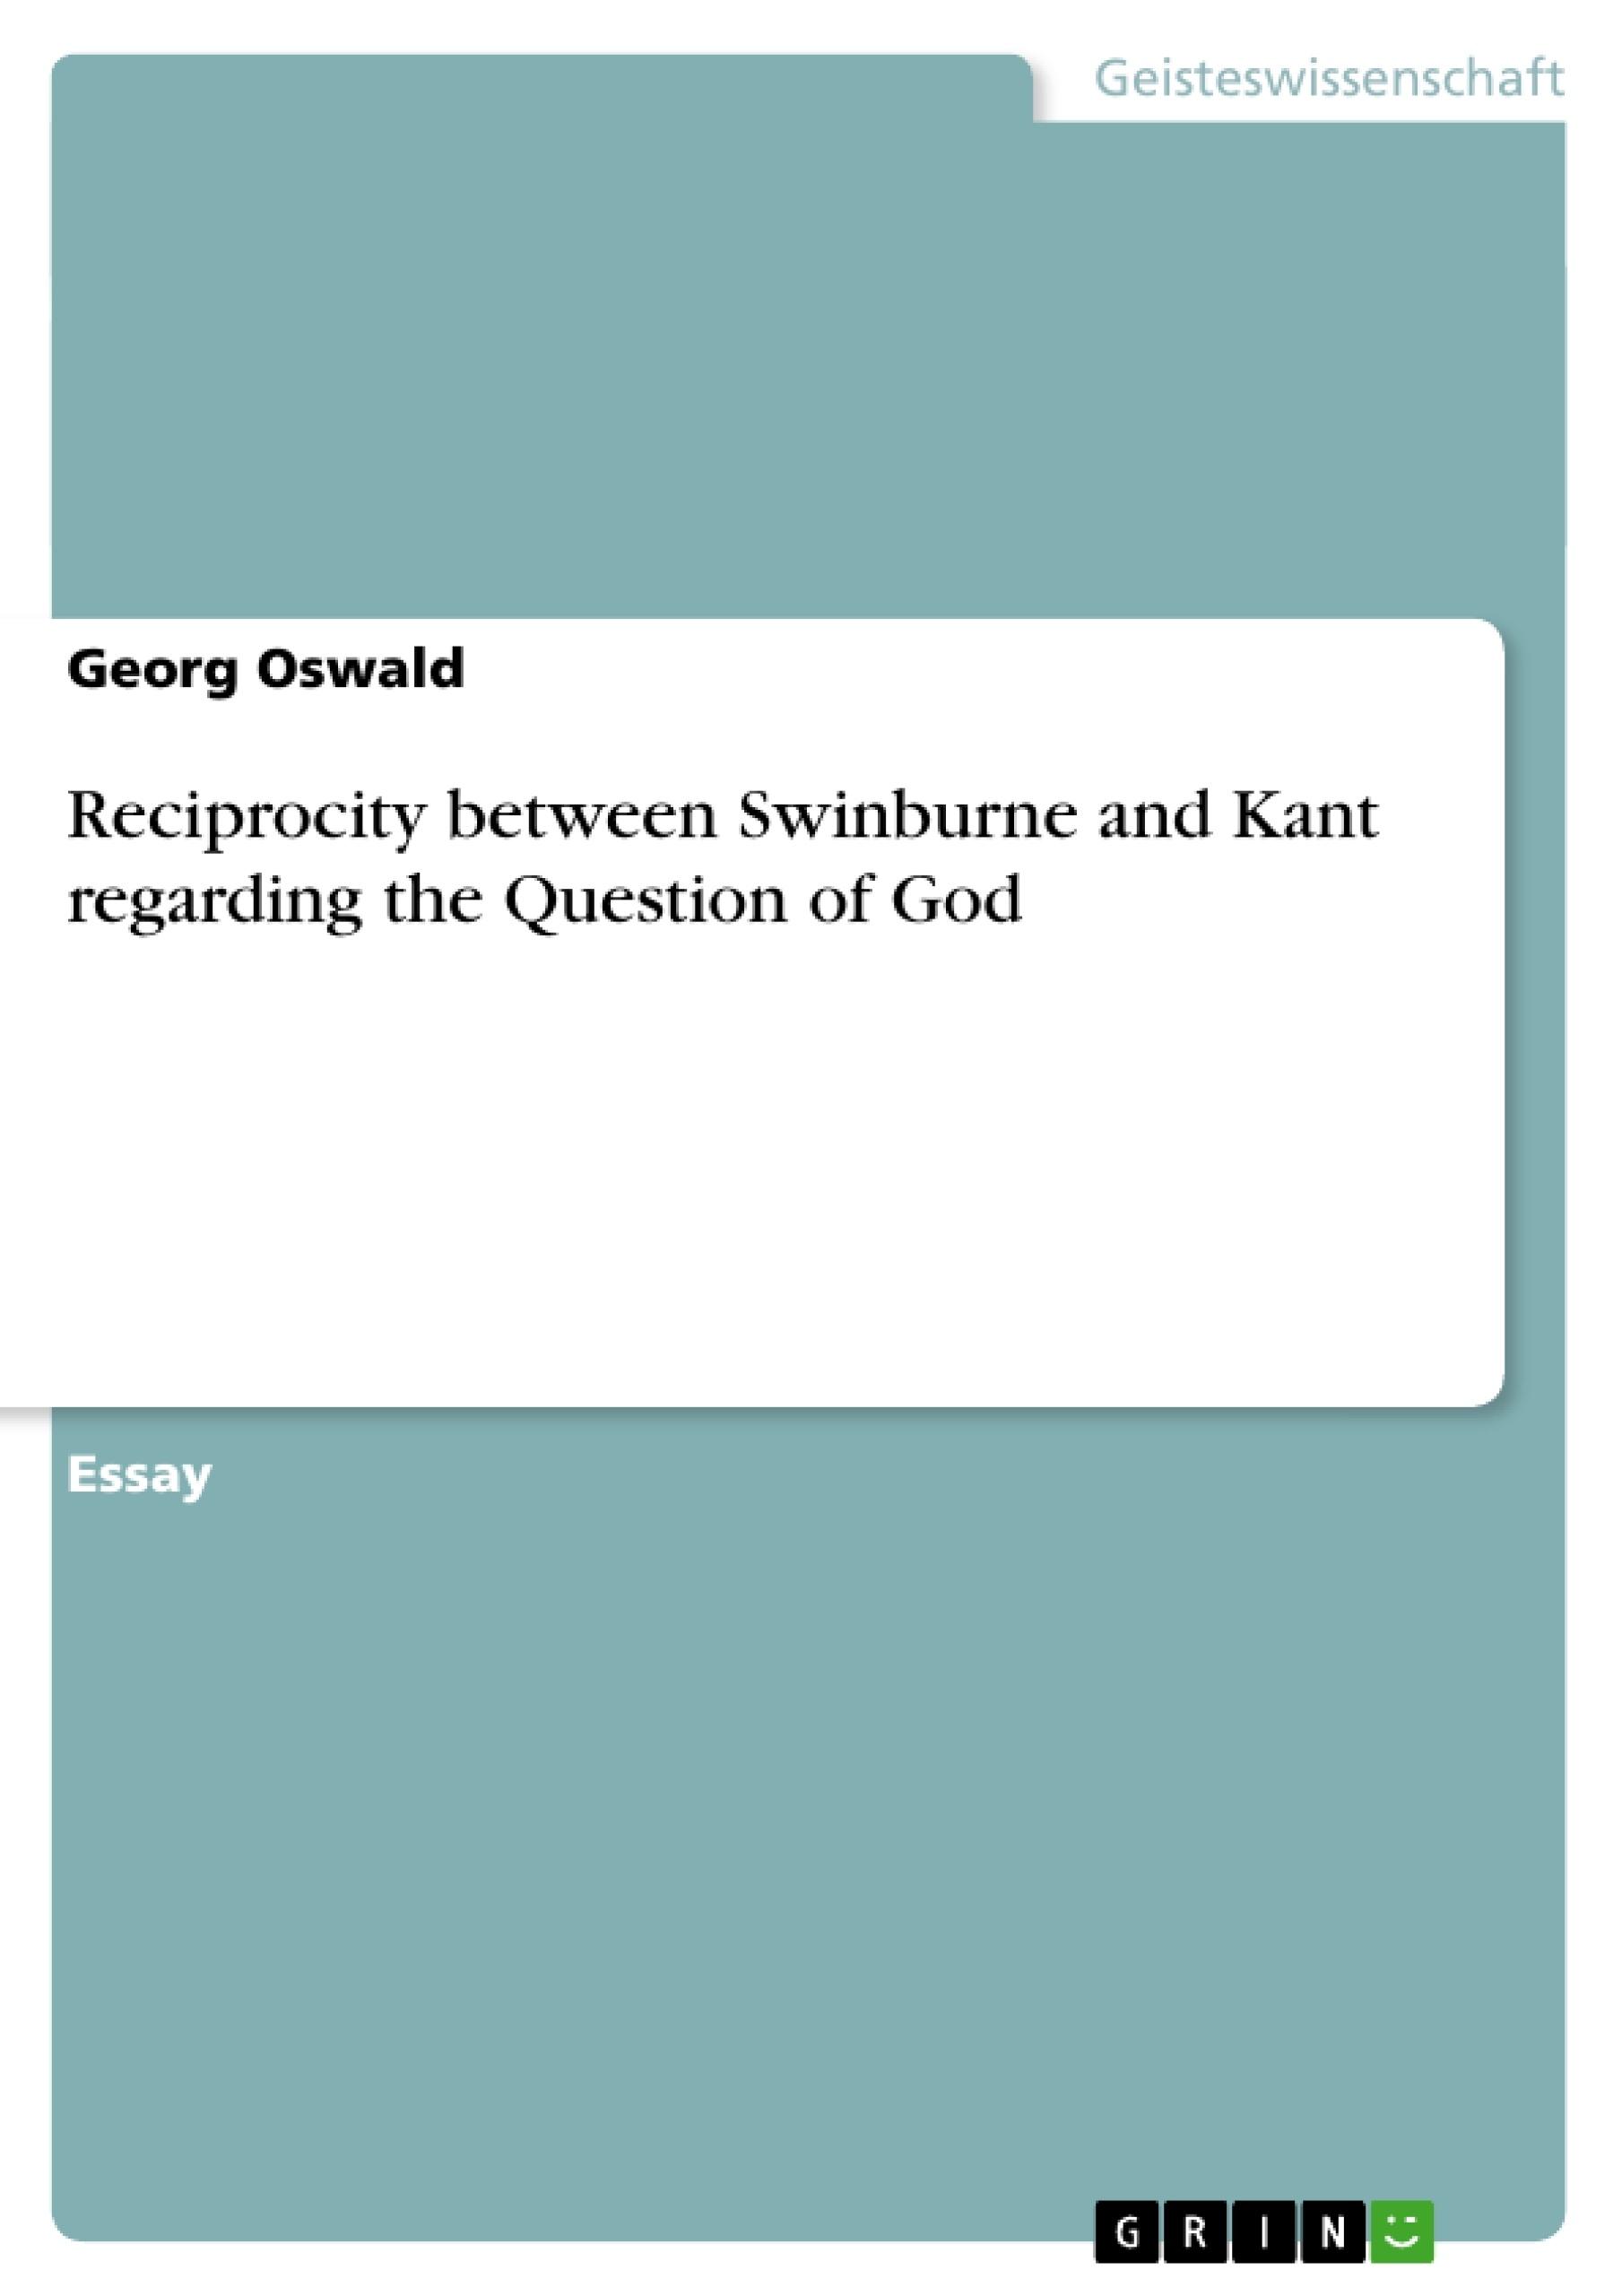 Titel: Reciprocity between Swinburne and Kant regarding the Question of God